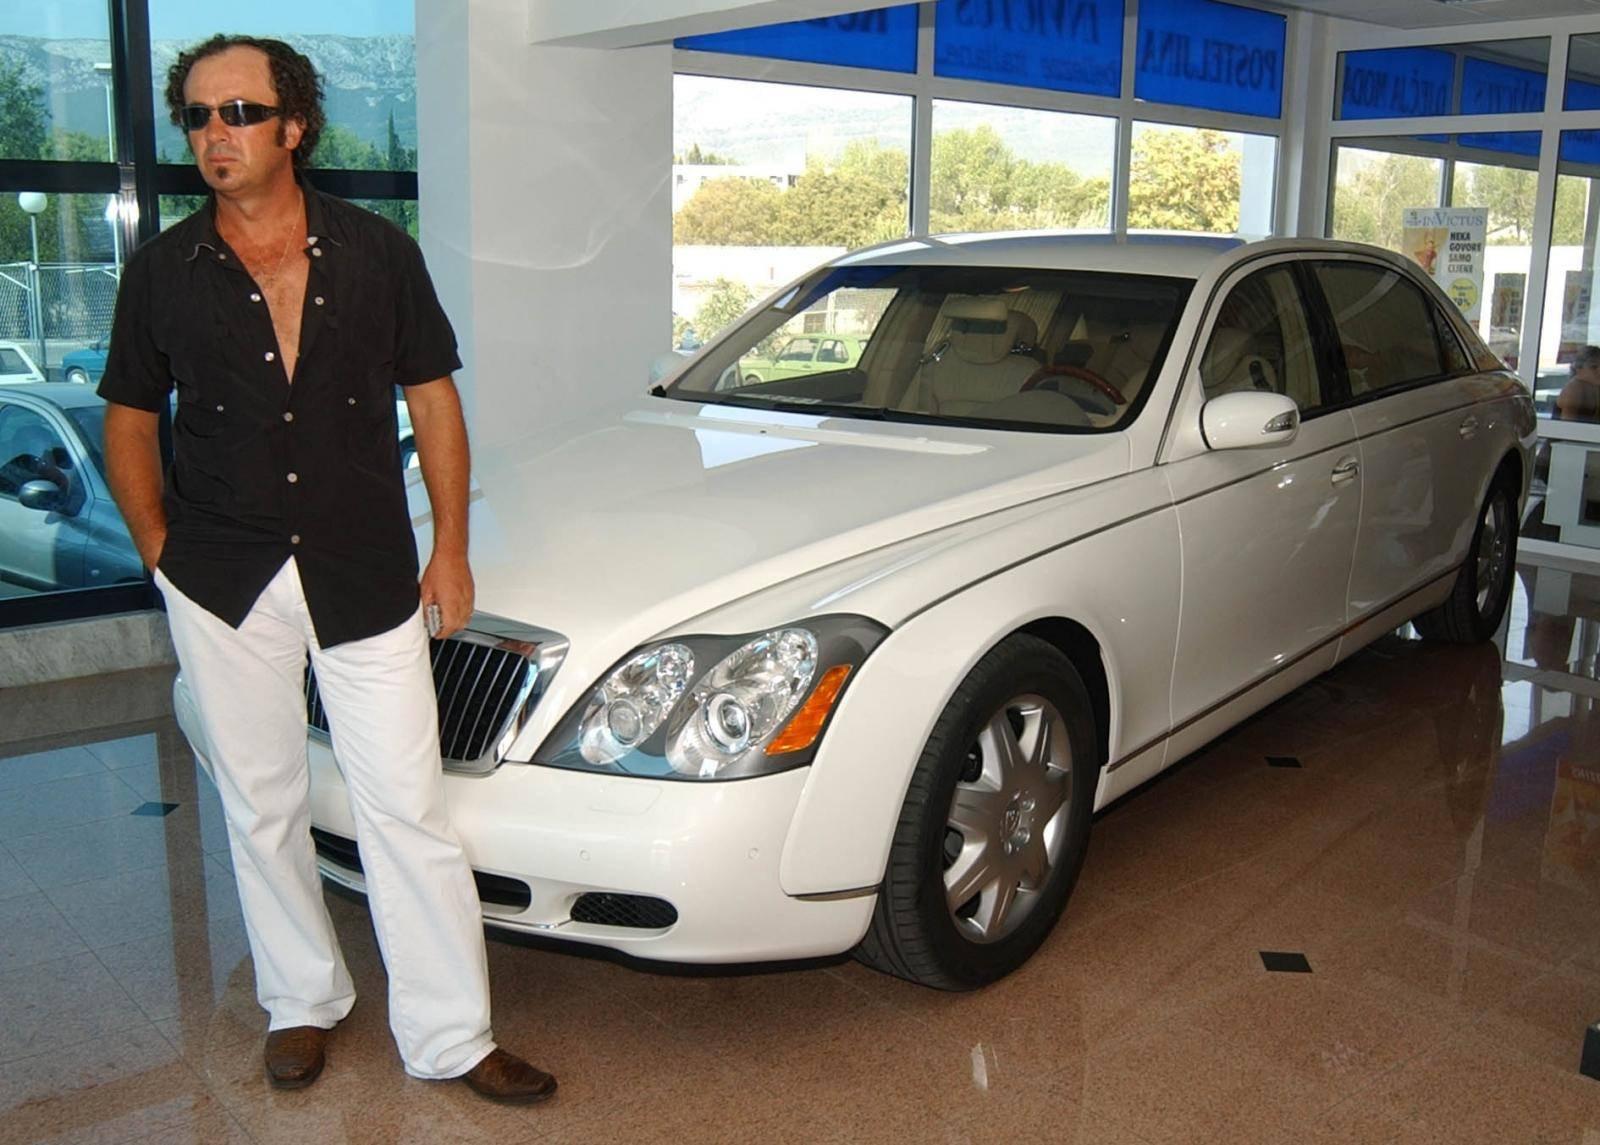 Skandali, luksuz i pršut: 'Ja kad vozin brzo, ja ne vozin brzo...'